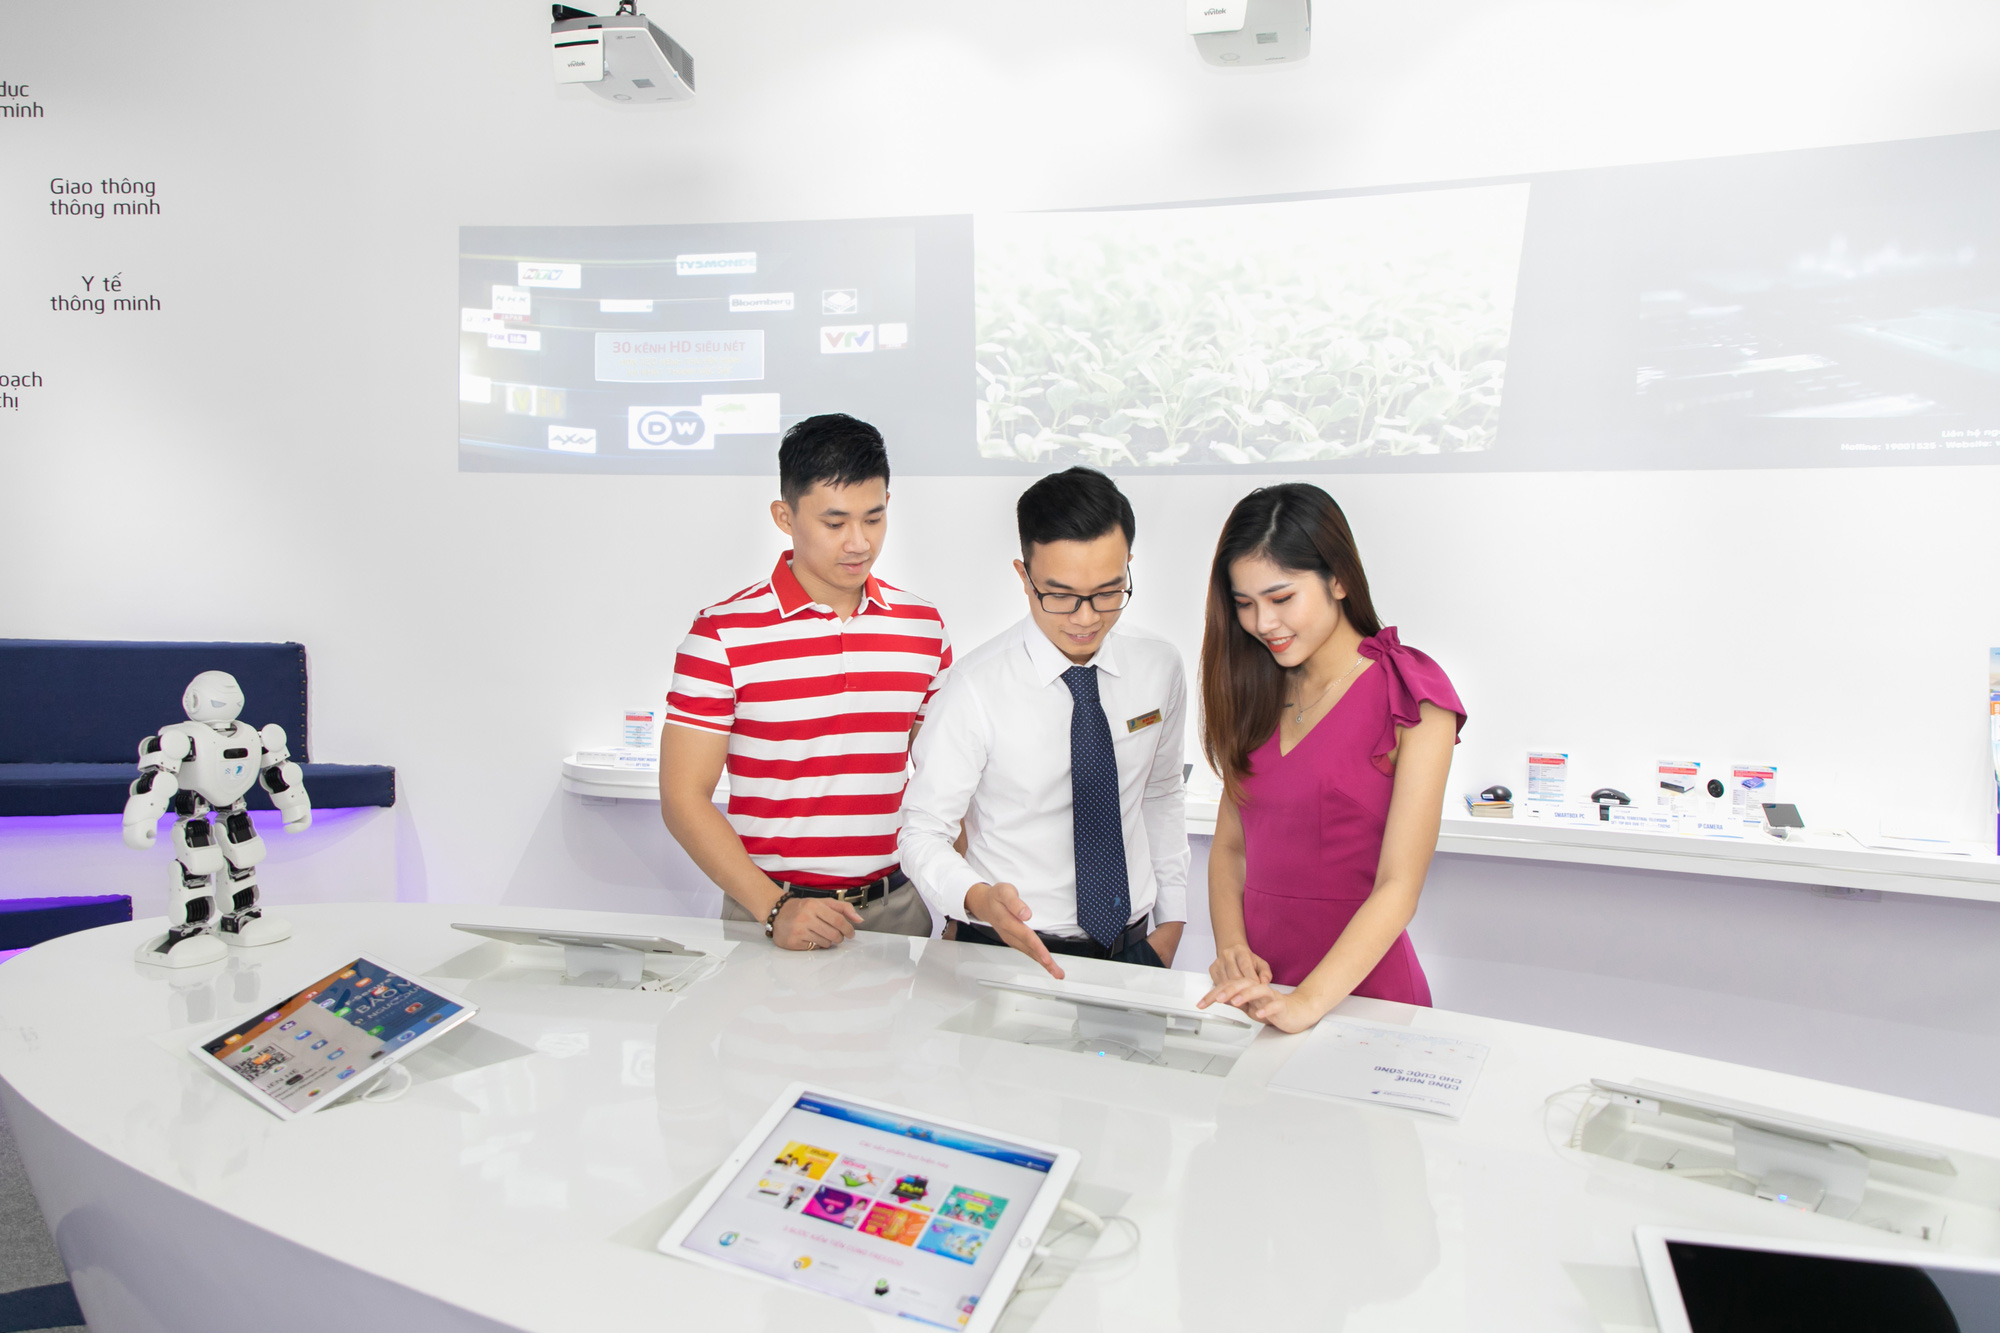 Vietnam's telecoms giant VNPT among biggest winners at IT World Awards 2020